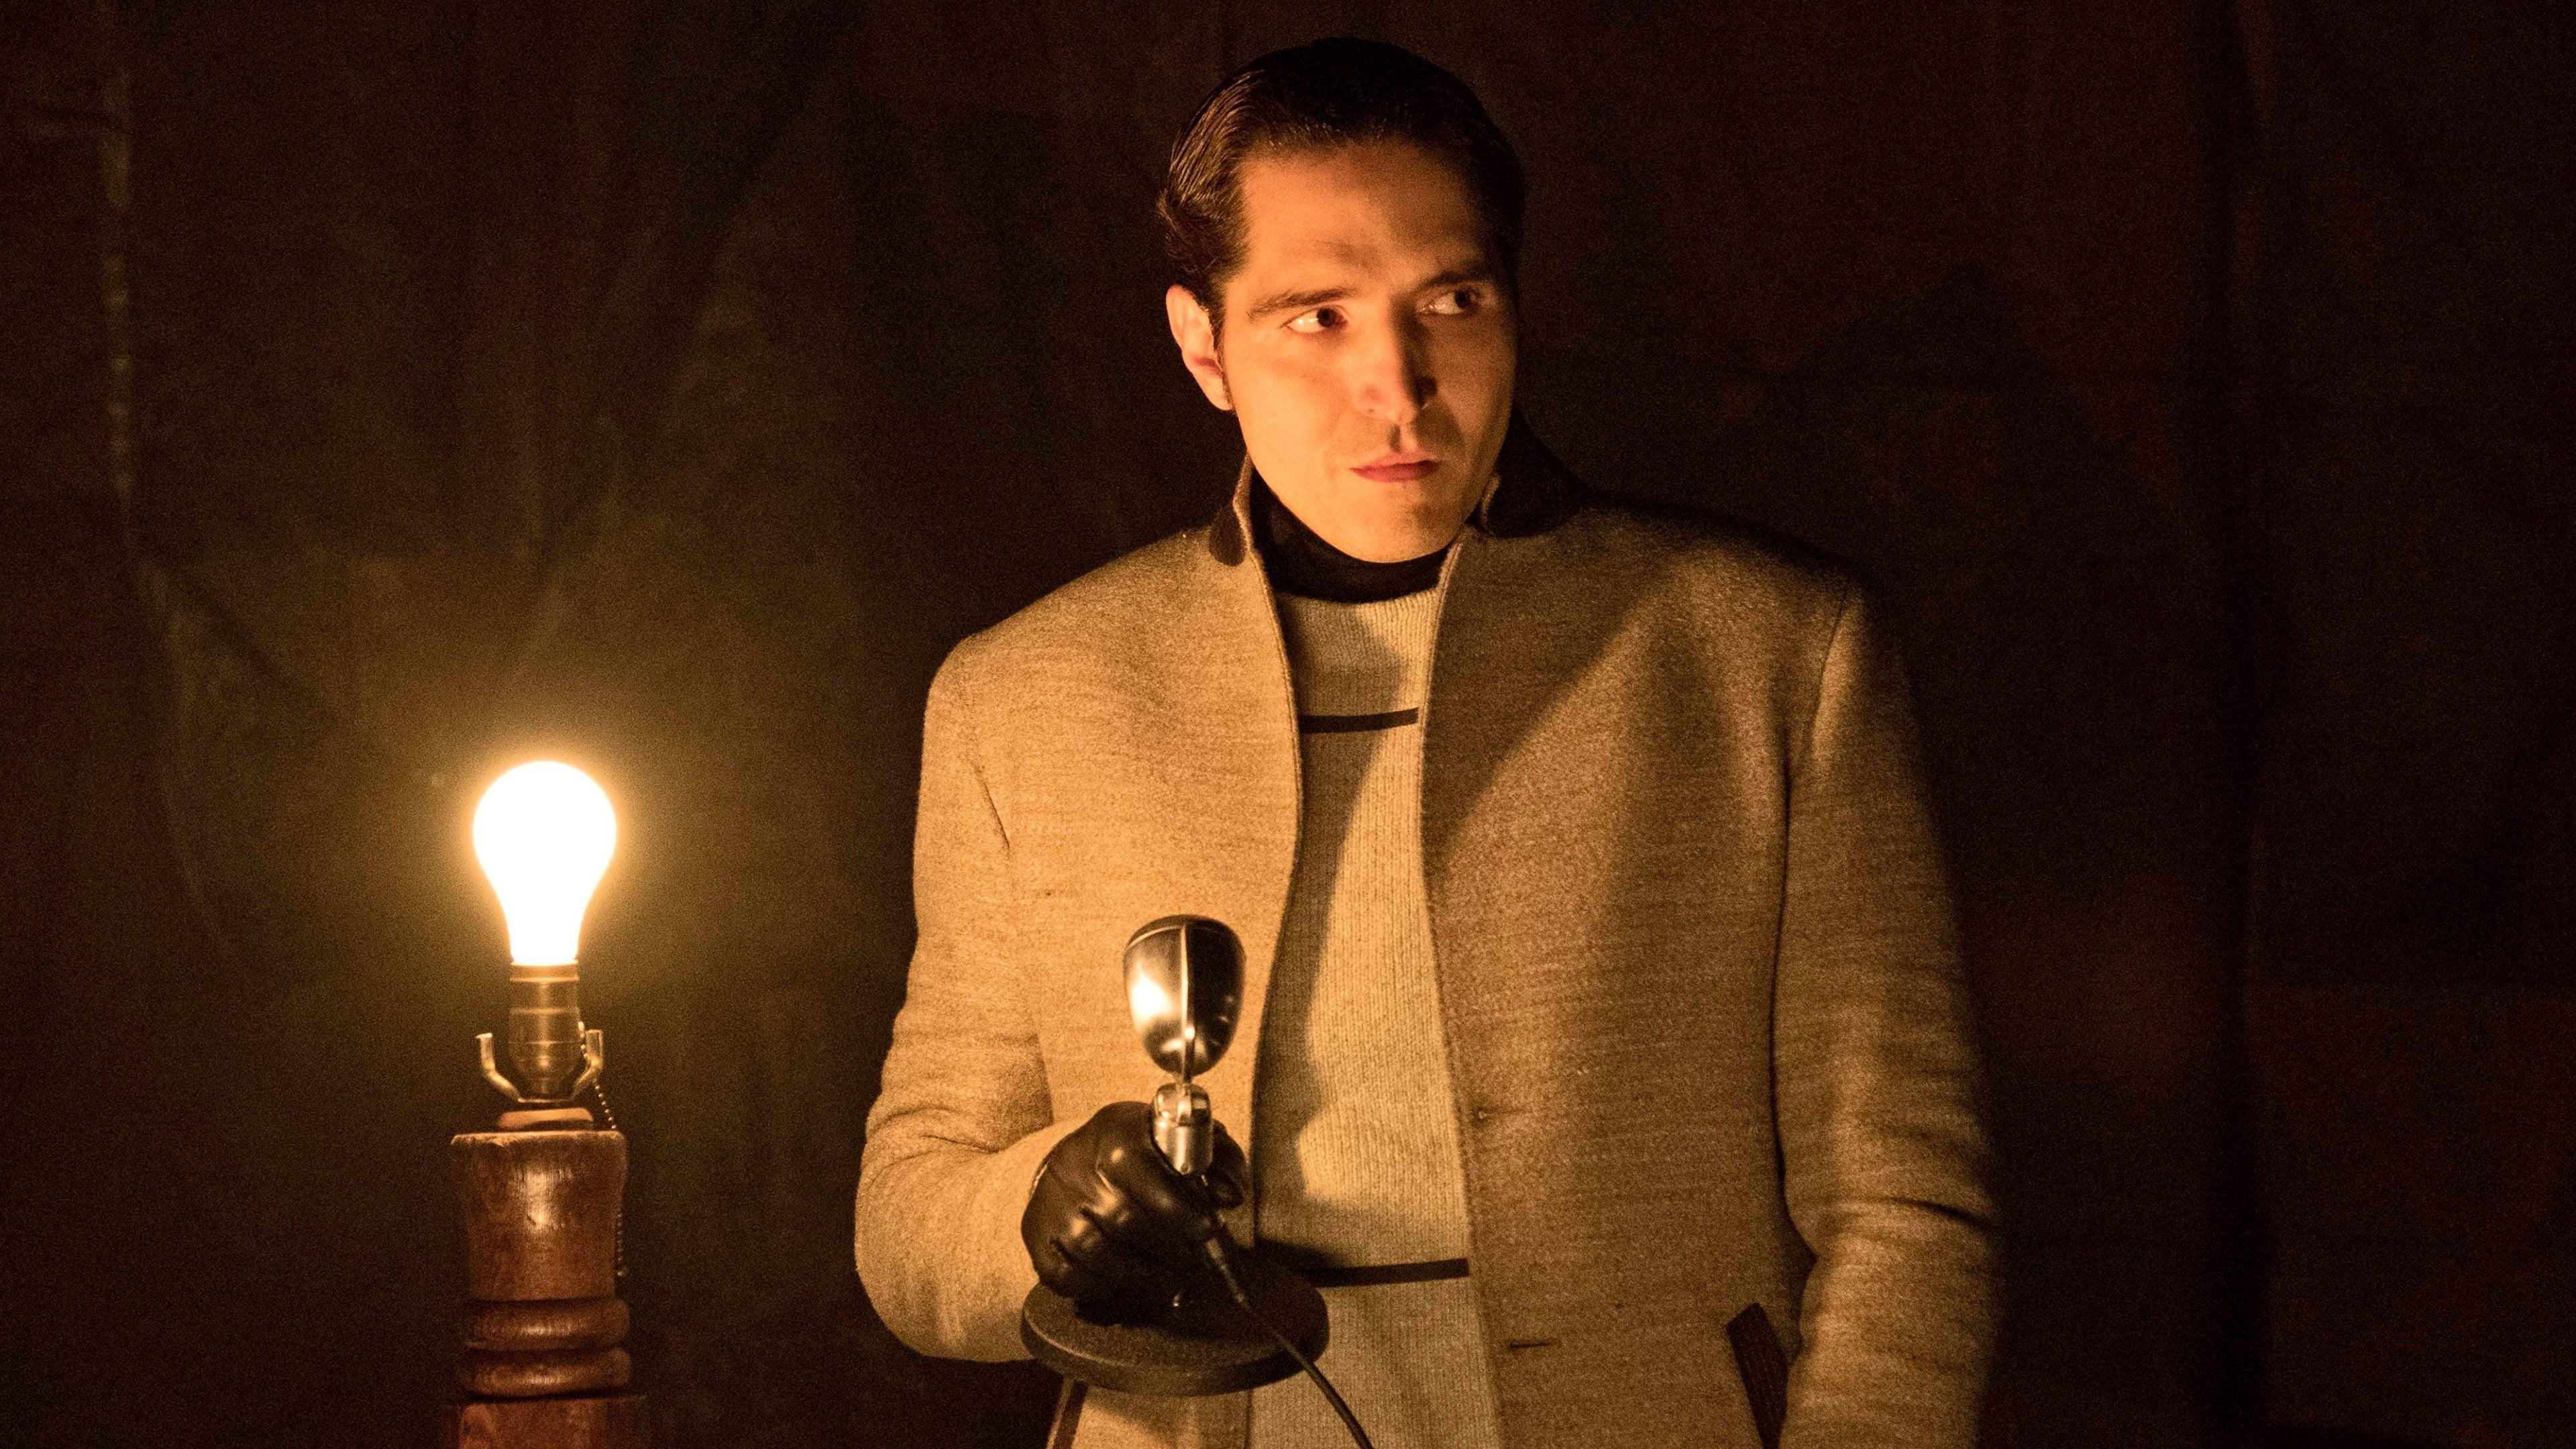 Gotham - Season 3 Episode 12 : Mad City: Ghosts